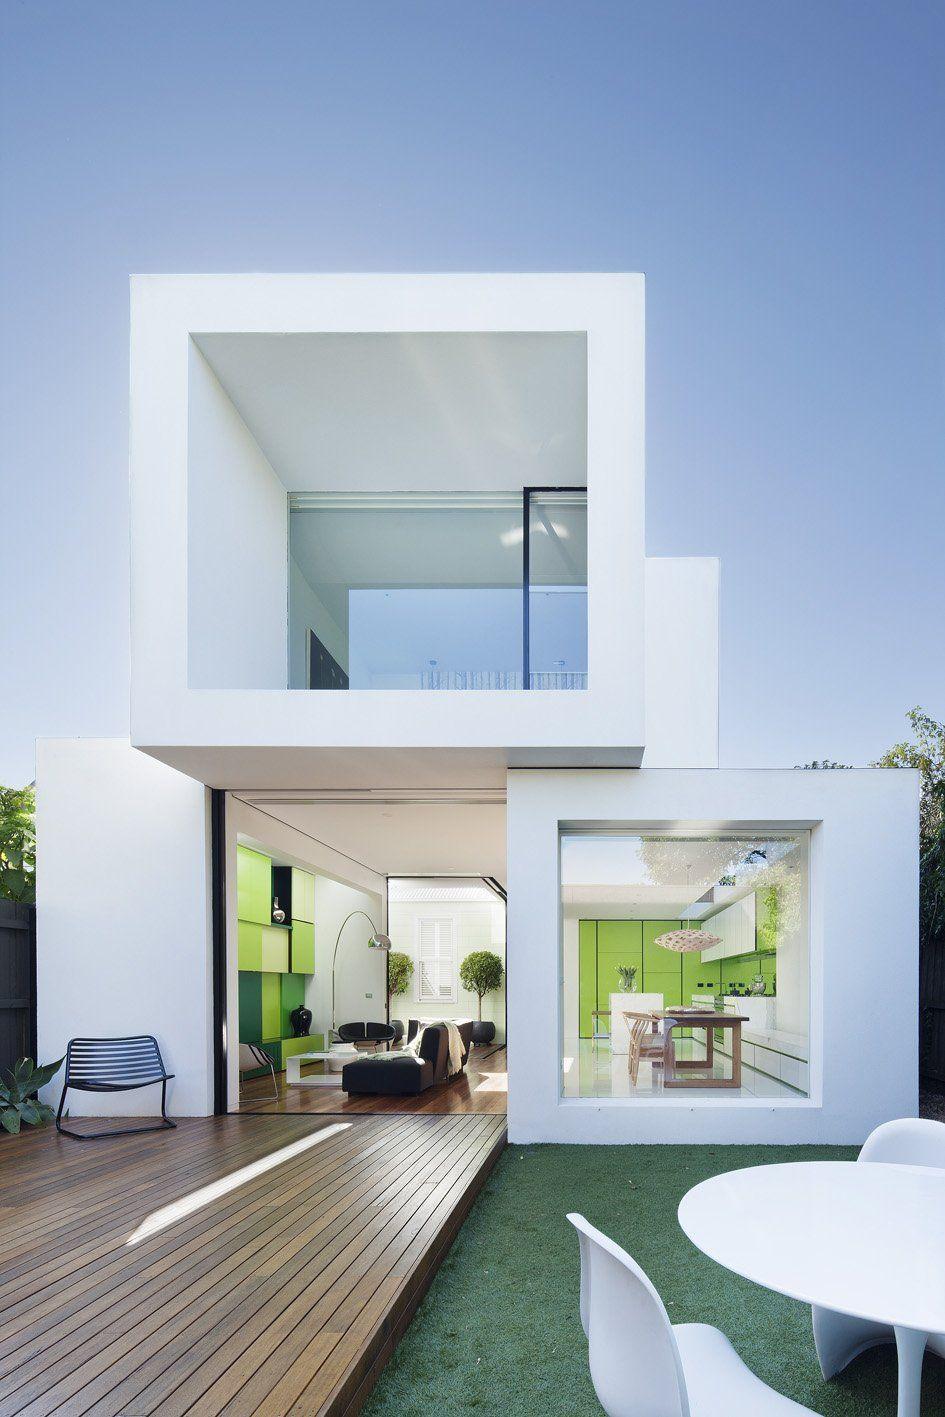 house designer - 1000+ images about Modern Minimalist rchitectural Design on ...